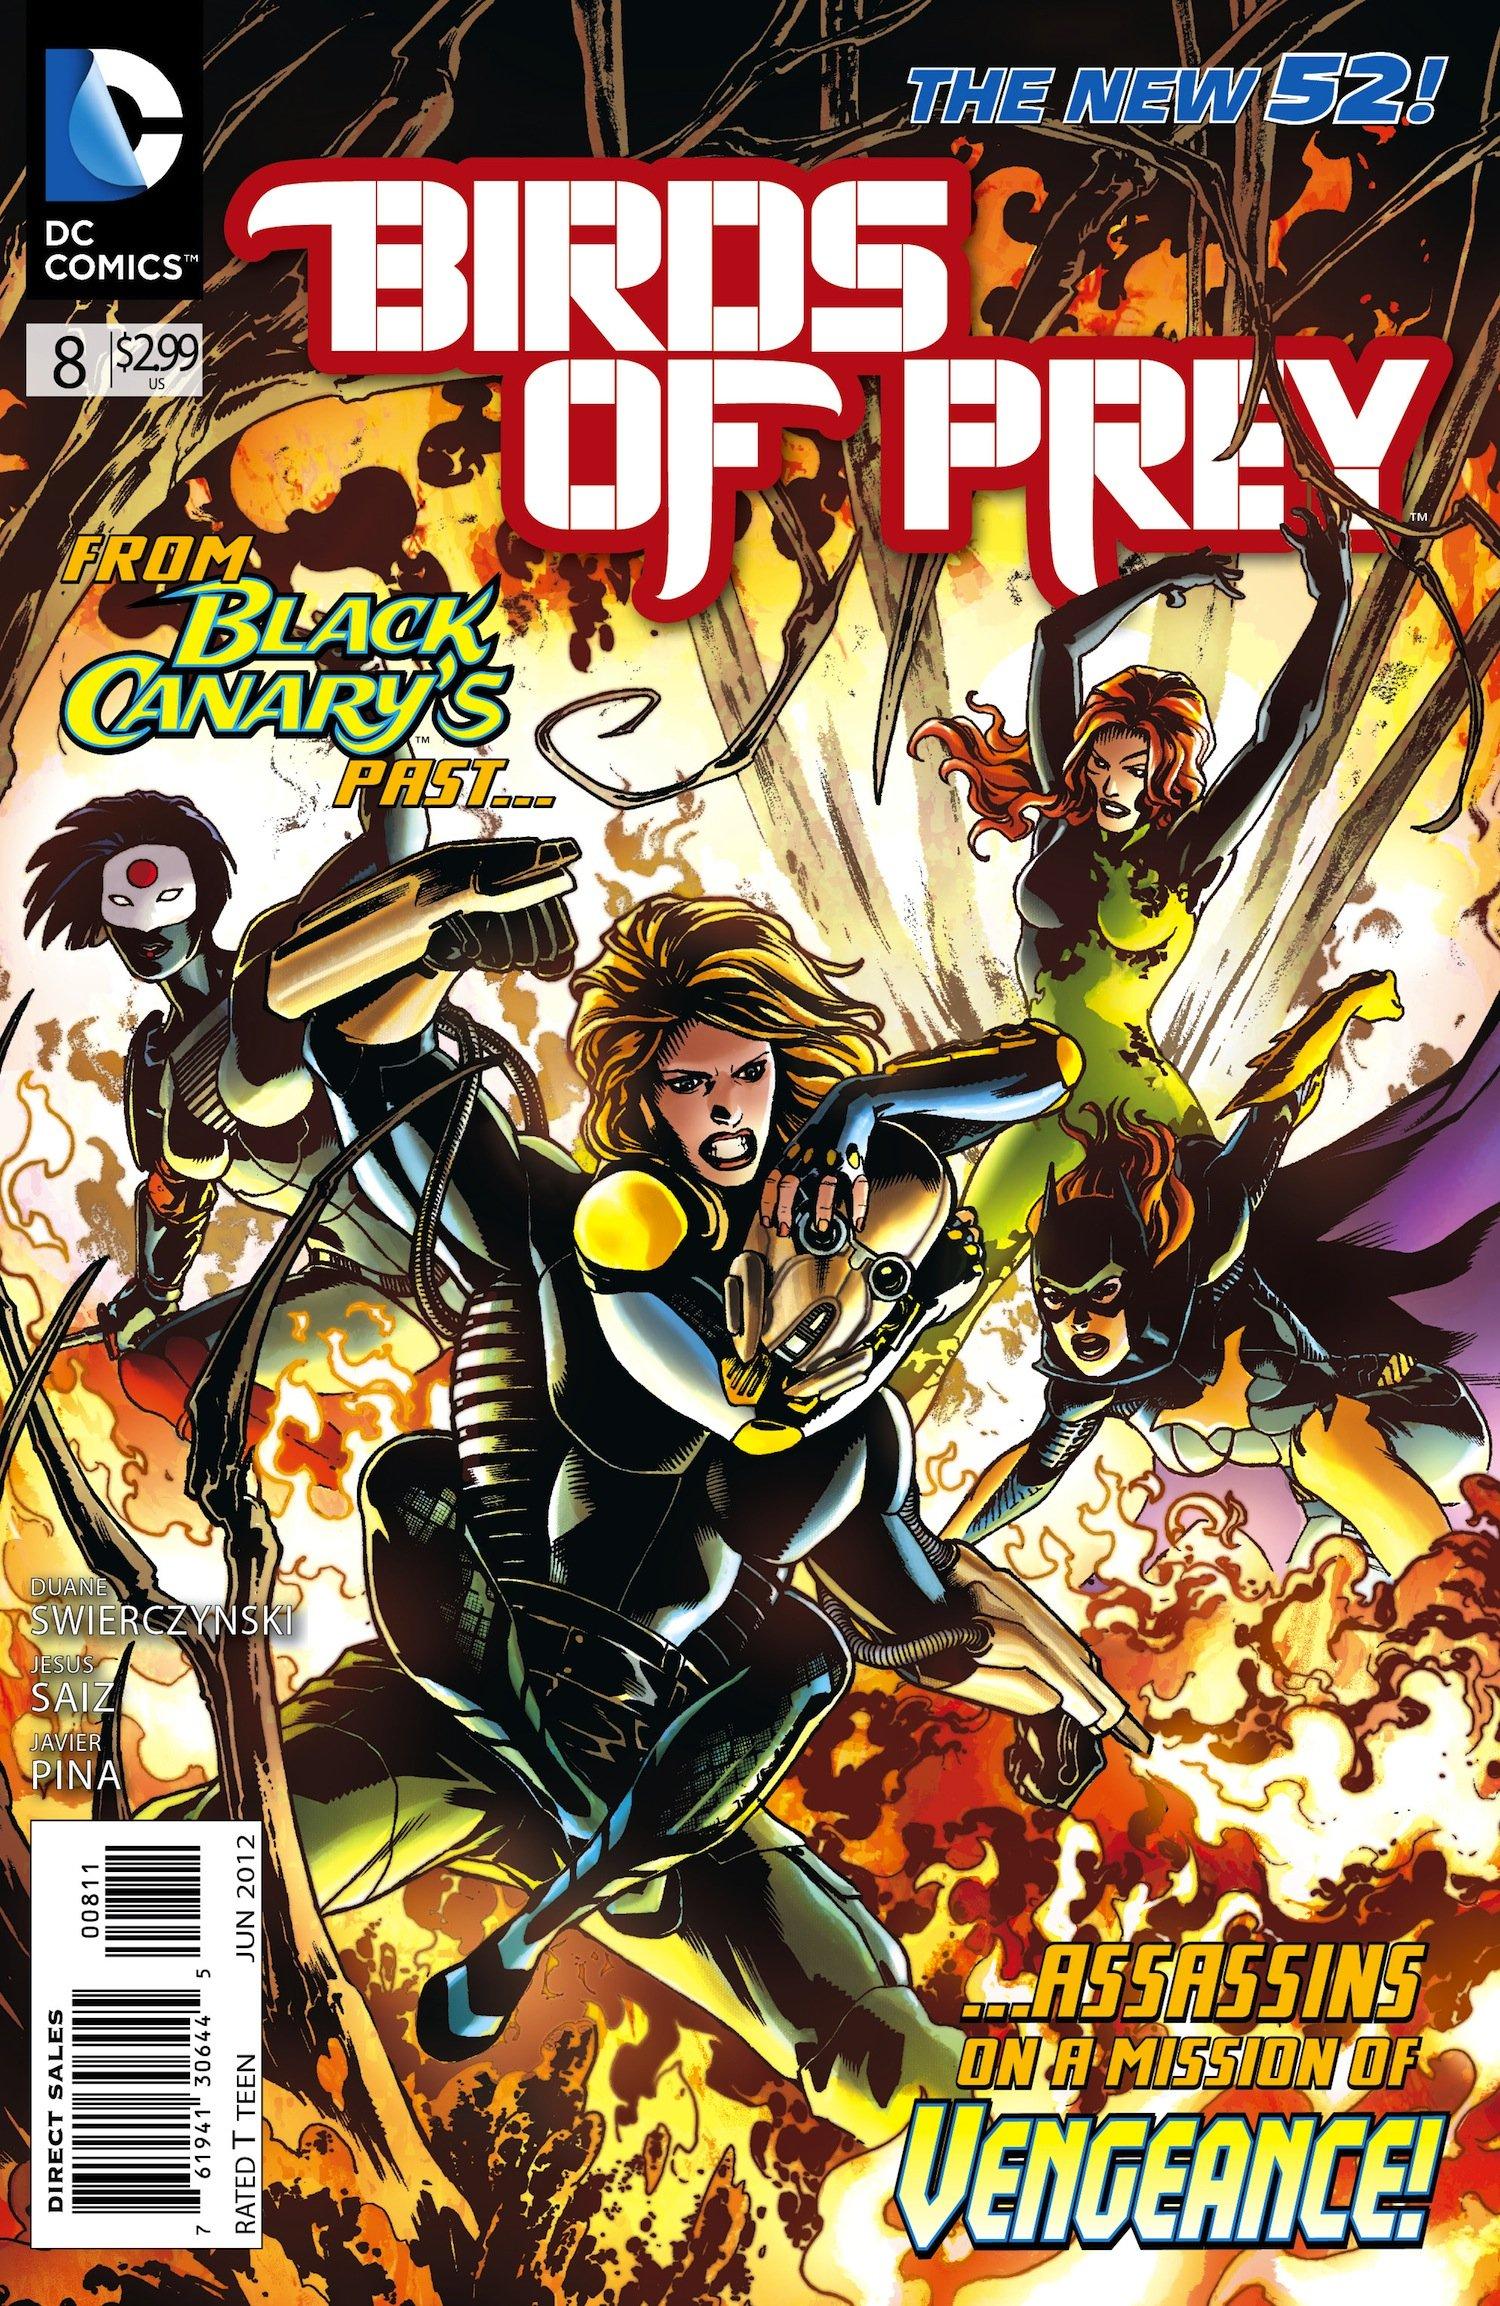 Amazon Com Birds Of Prey 8 Rumor Has It That Dinah Lance A K A Black Canary Killed A Man With Her Sonic Scream Swierczynski Books